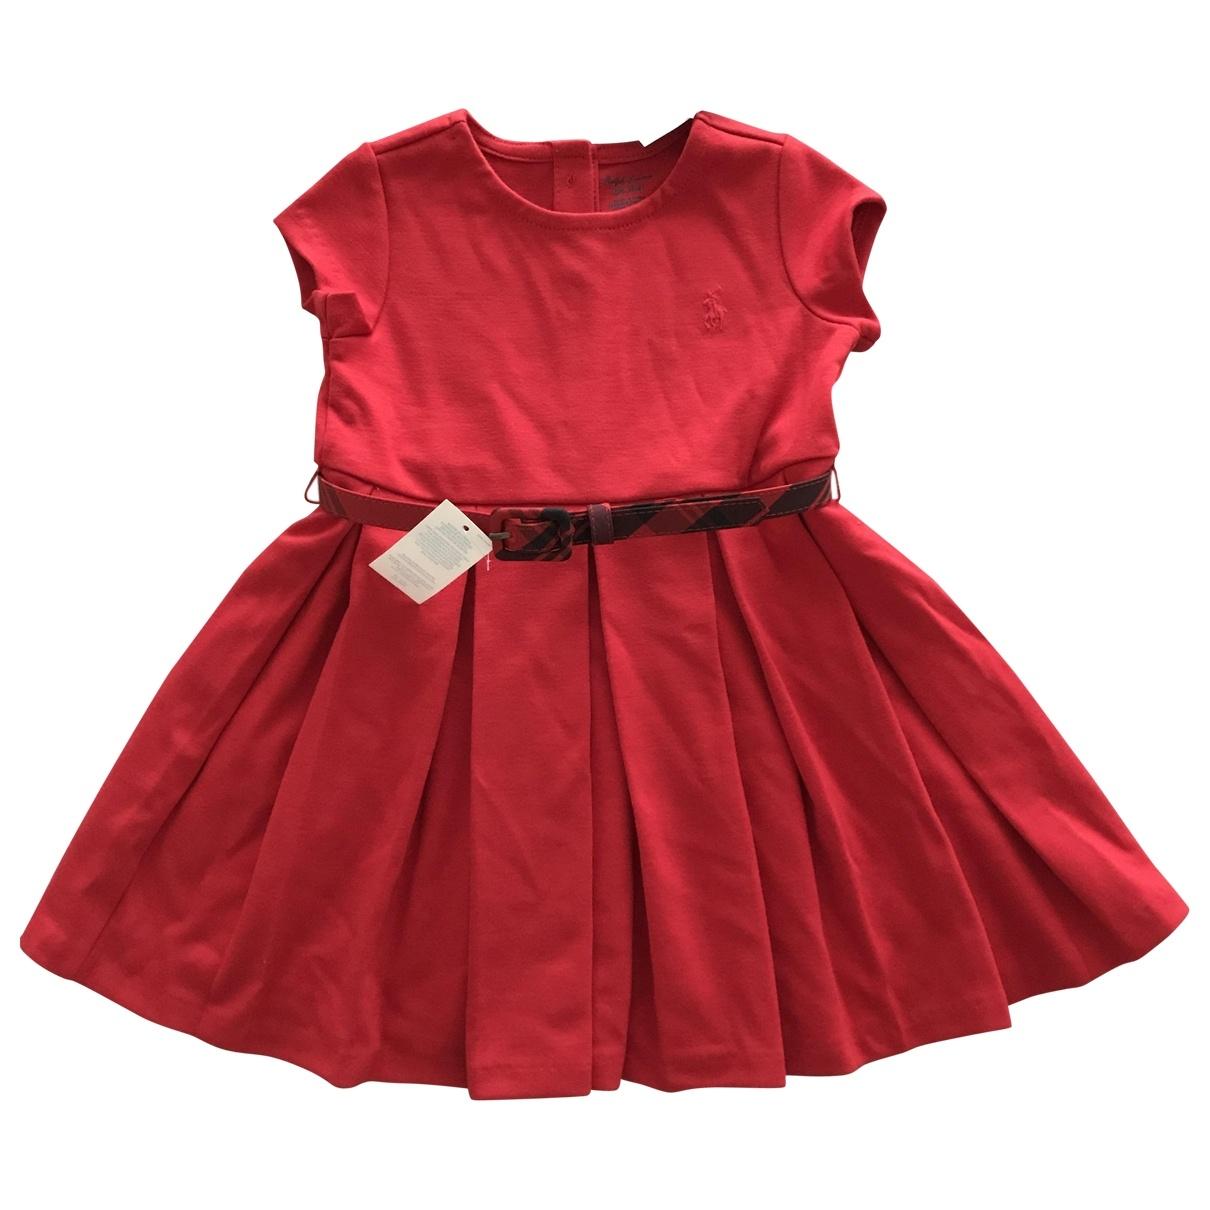 Ralph Lauren \N Red Cotton dress for Kids 12 months - up to 74cm FR